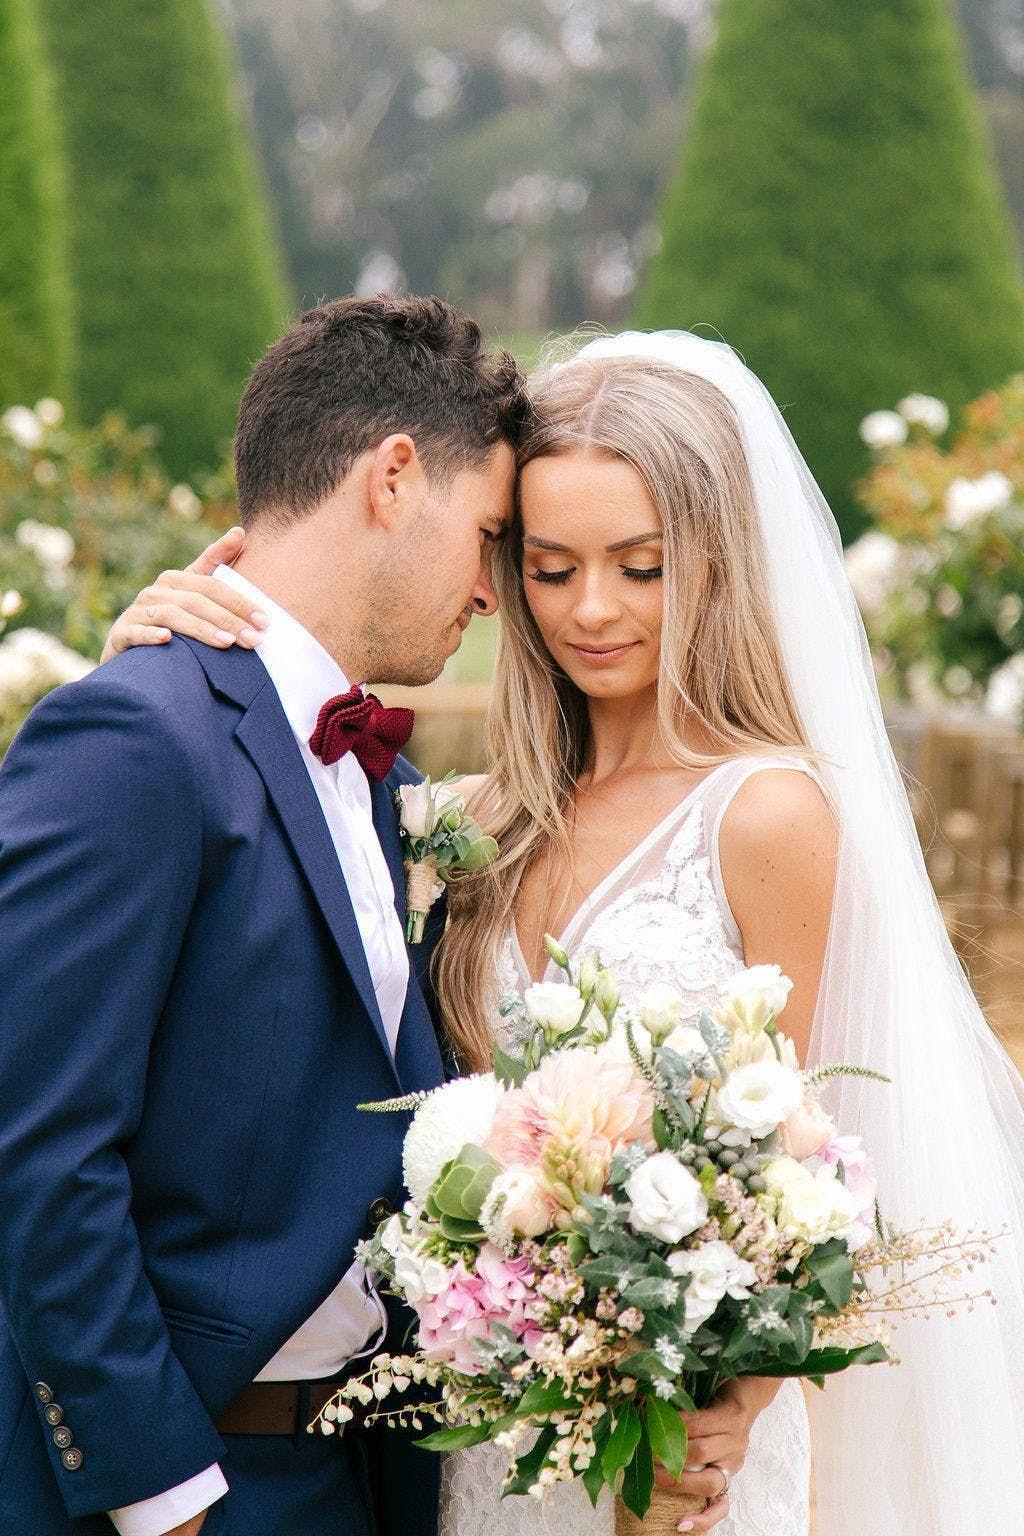 Mornington Peninsula Wedding Photography Lindenderry - Mornington Peninsula Wedding Photographer